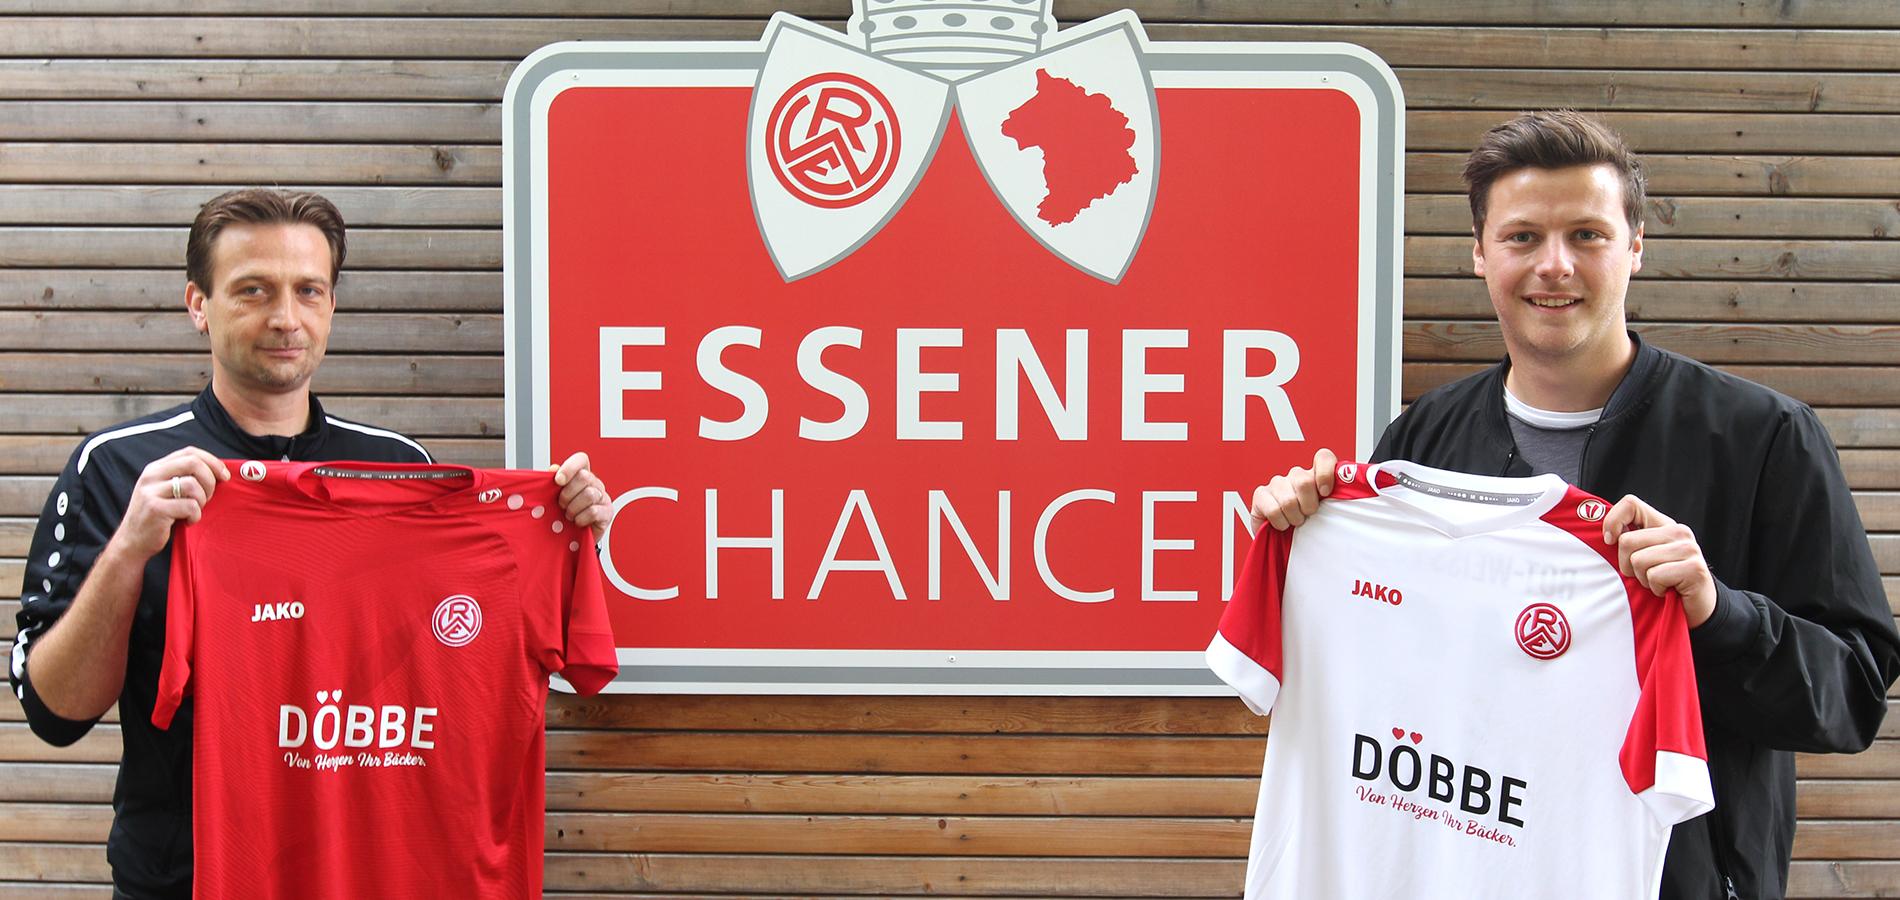 Schick: Trainer Benjamin de Biasi (l.) und Johannes Döbbe präsentiert das neue Dress der rot-weissen Inklusionsmannschaft.